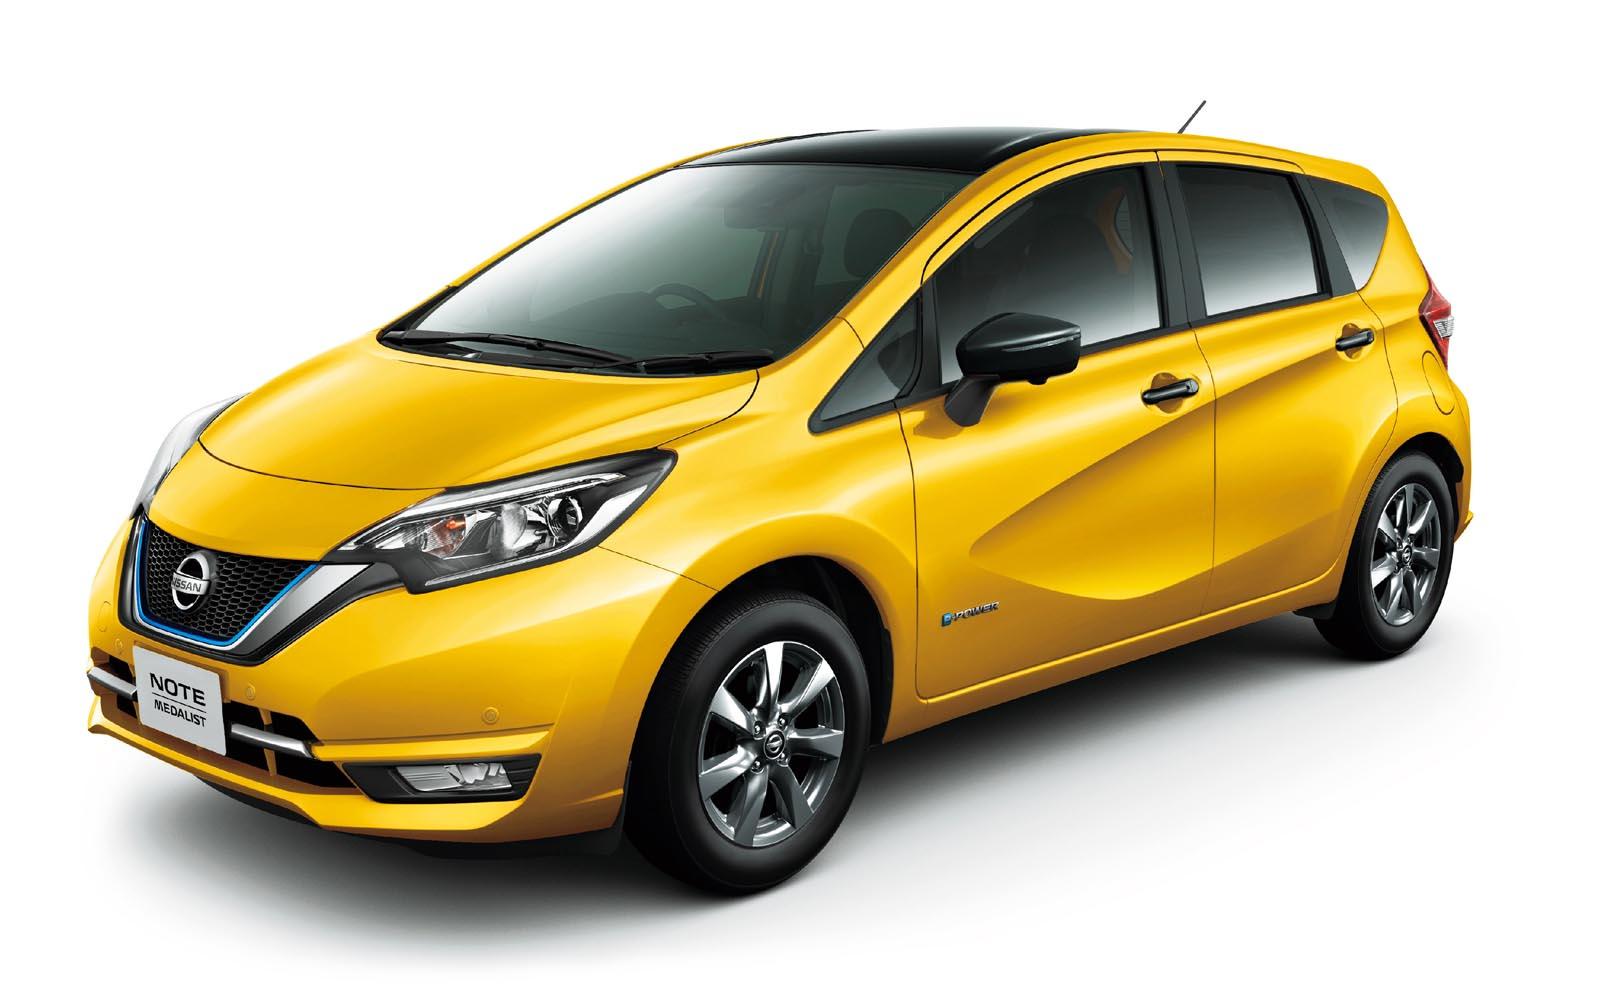 Photo of Το Nissan Note ήταν το δημοφιλέστερο μοντέλο στην Ιαπωνία